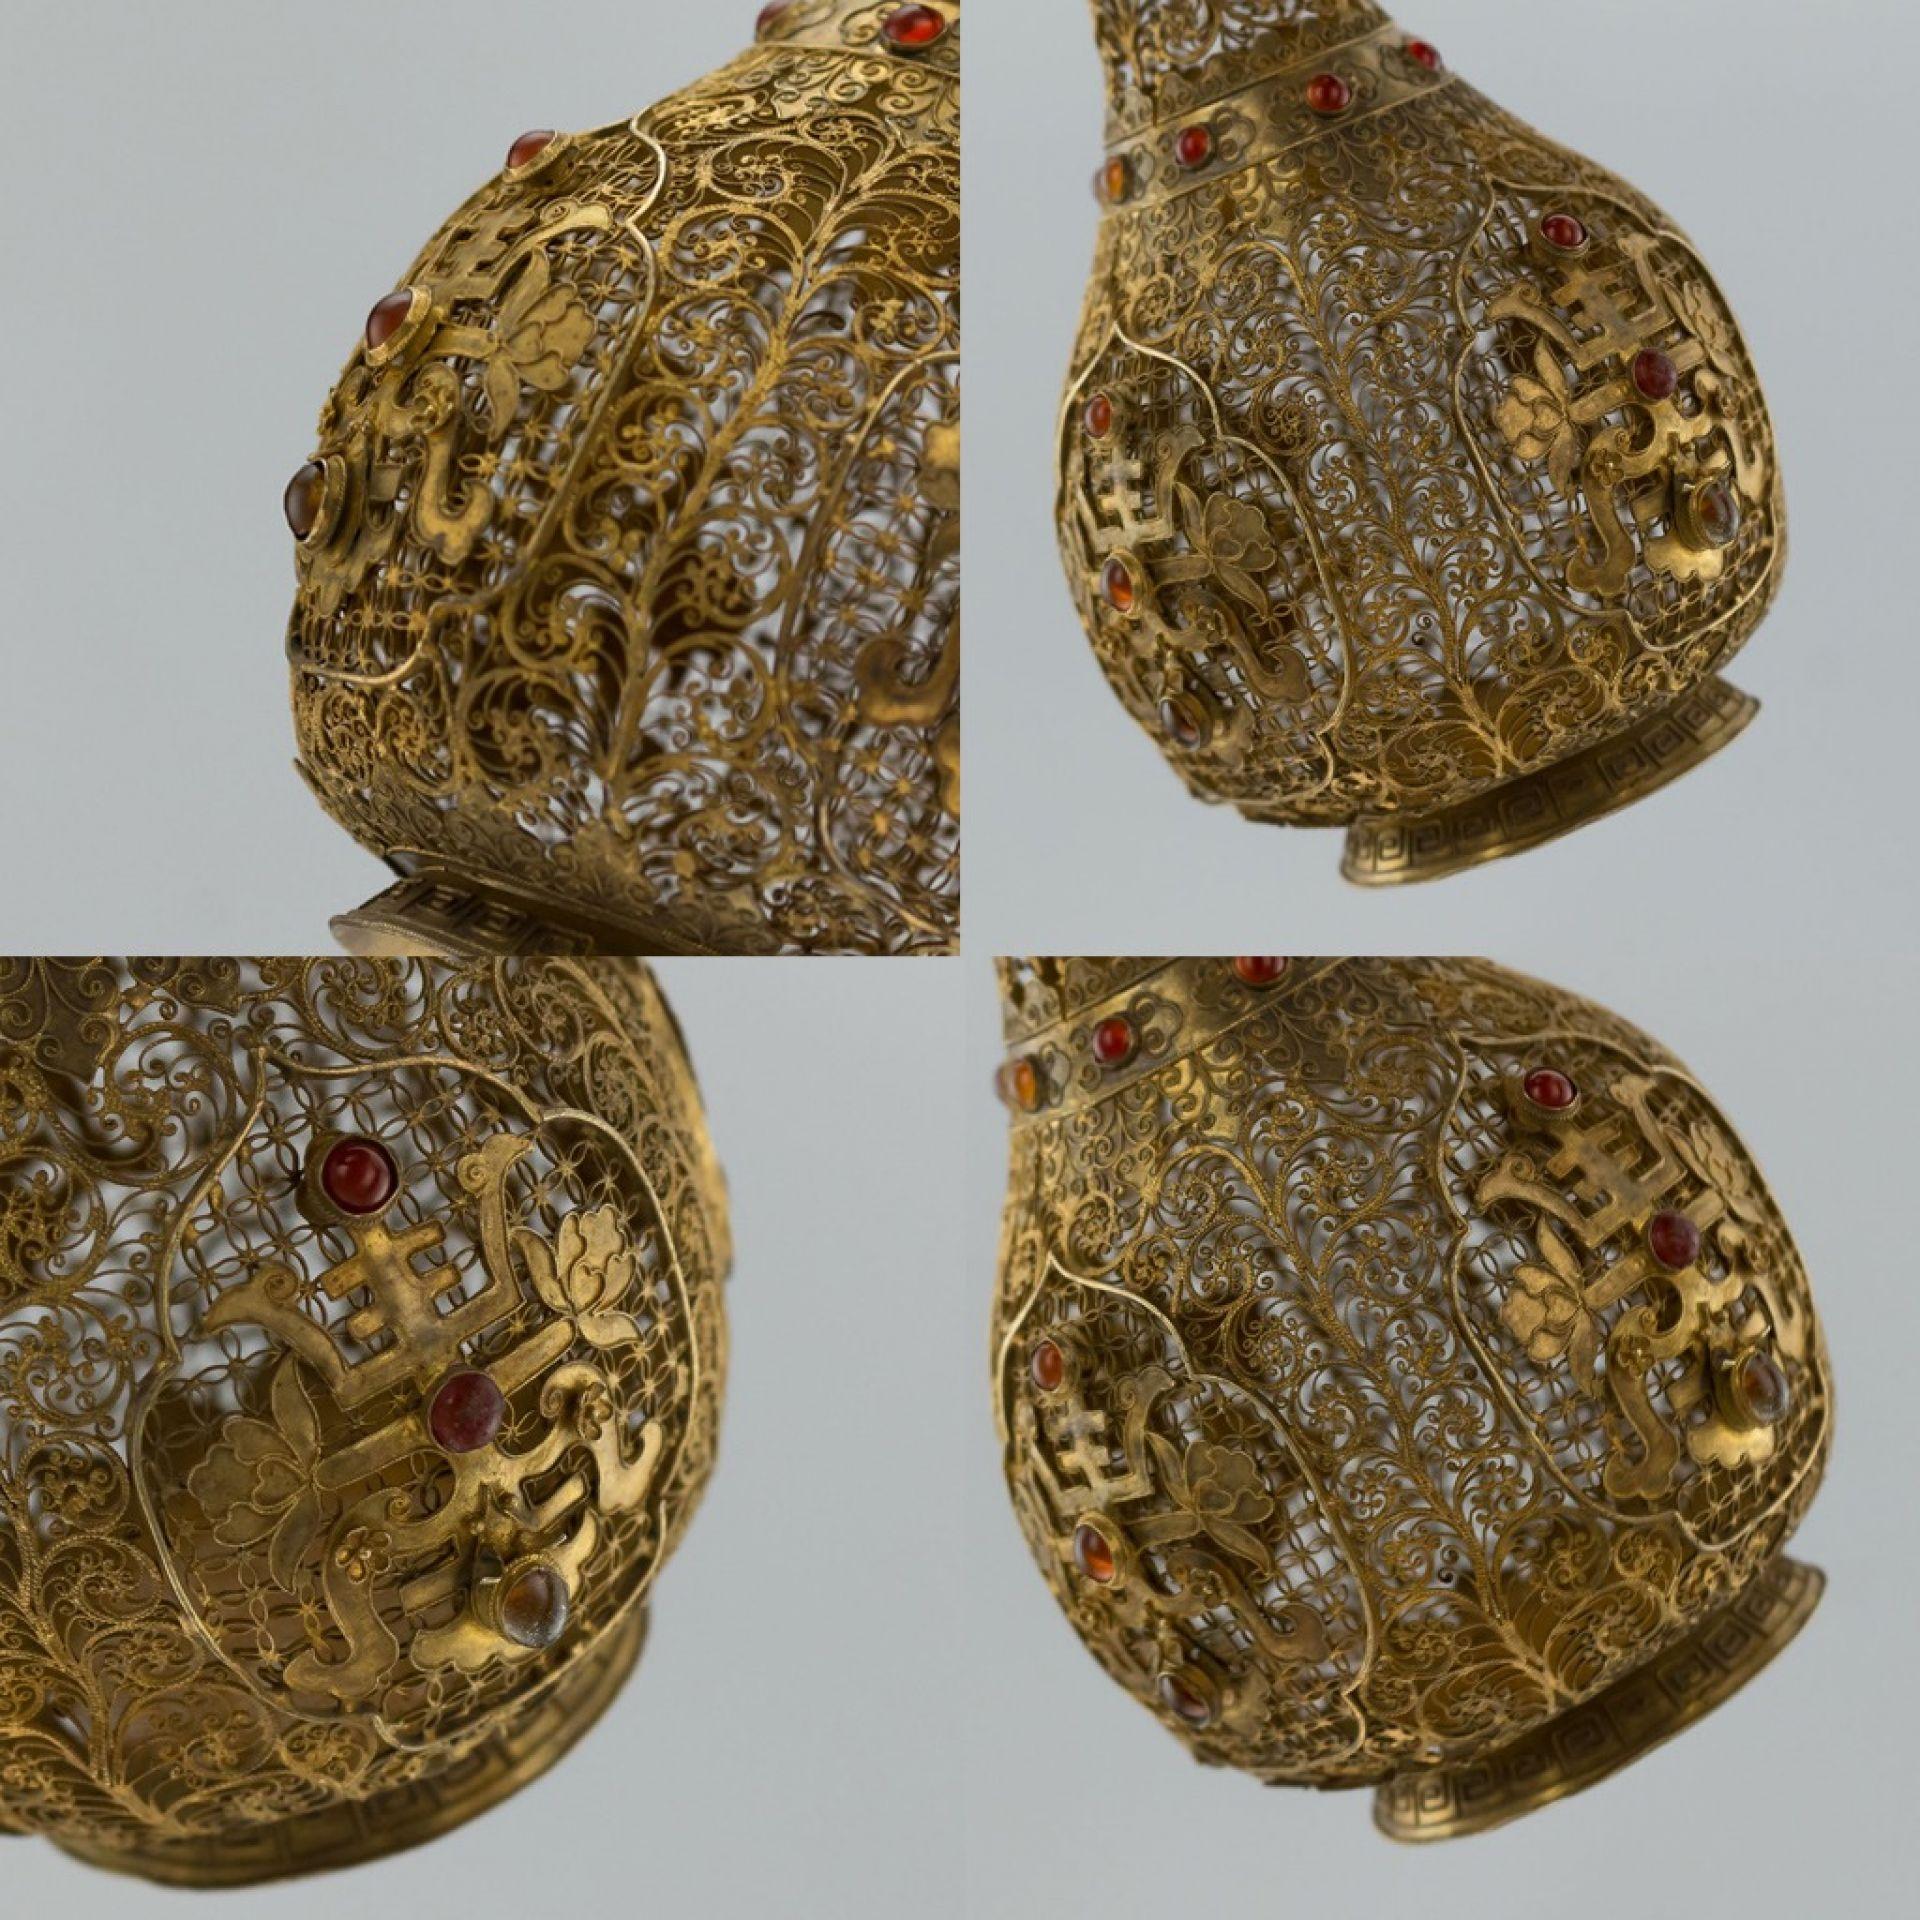 ANTIQUE 18thC RARE CHINESE SILVER GILT FILIGREE & GEM SET VASE c.1760